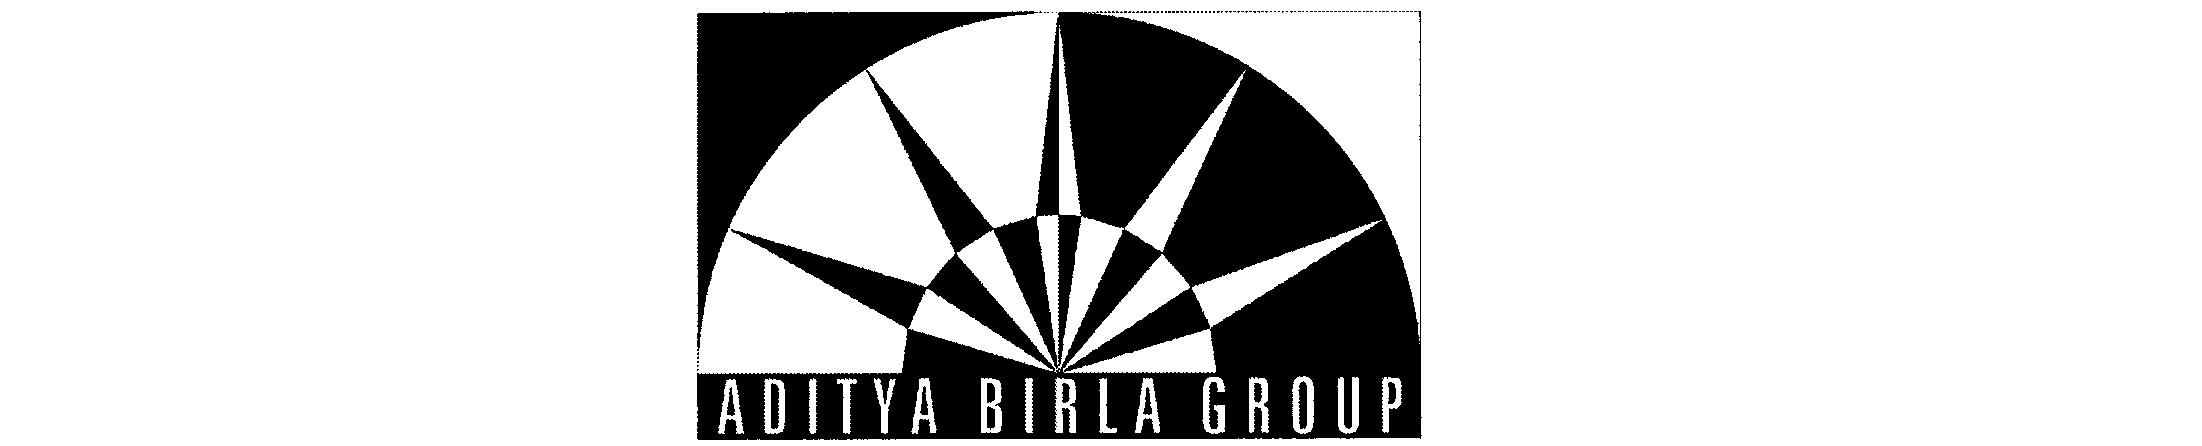 Aditya Birla Group : Aditya birla group by management corporation